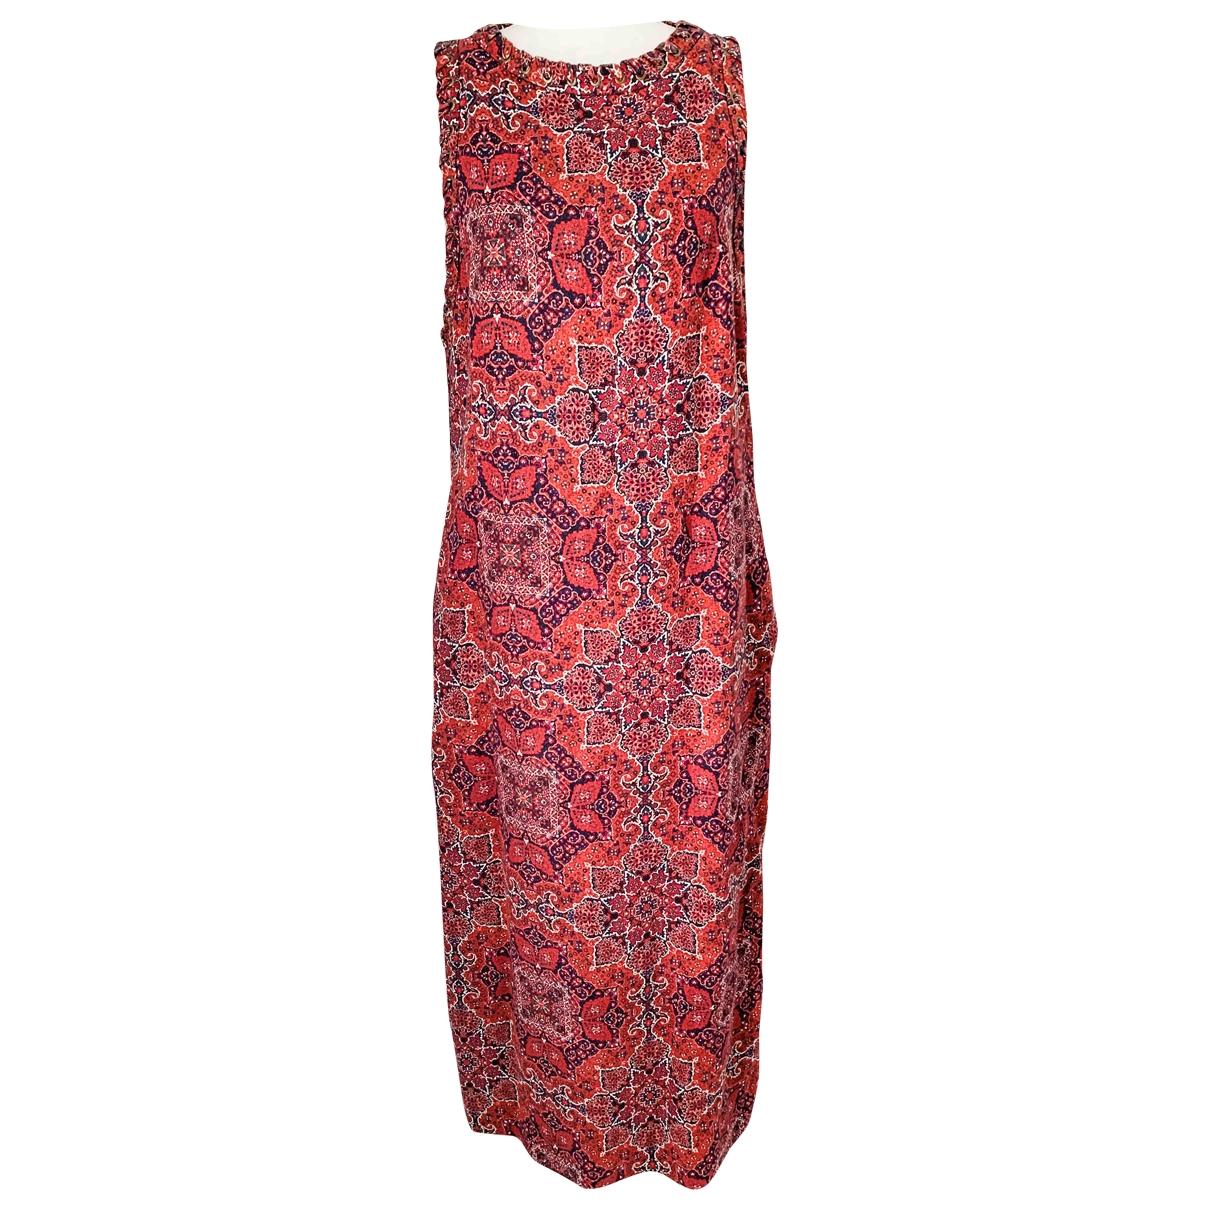 Zimmermann \N Red Cotton dress for Women 1 0-5